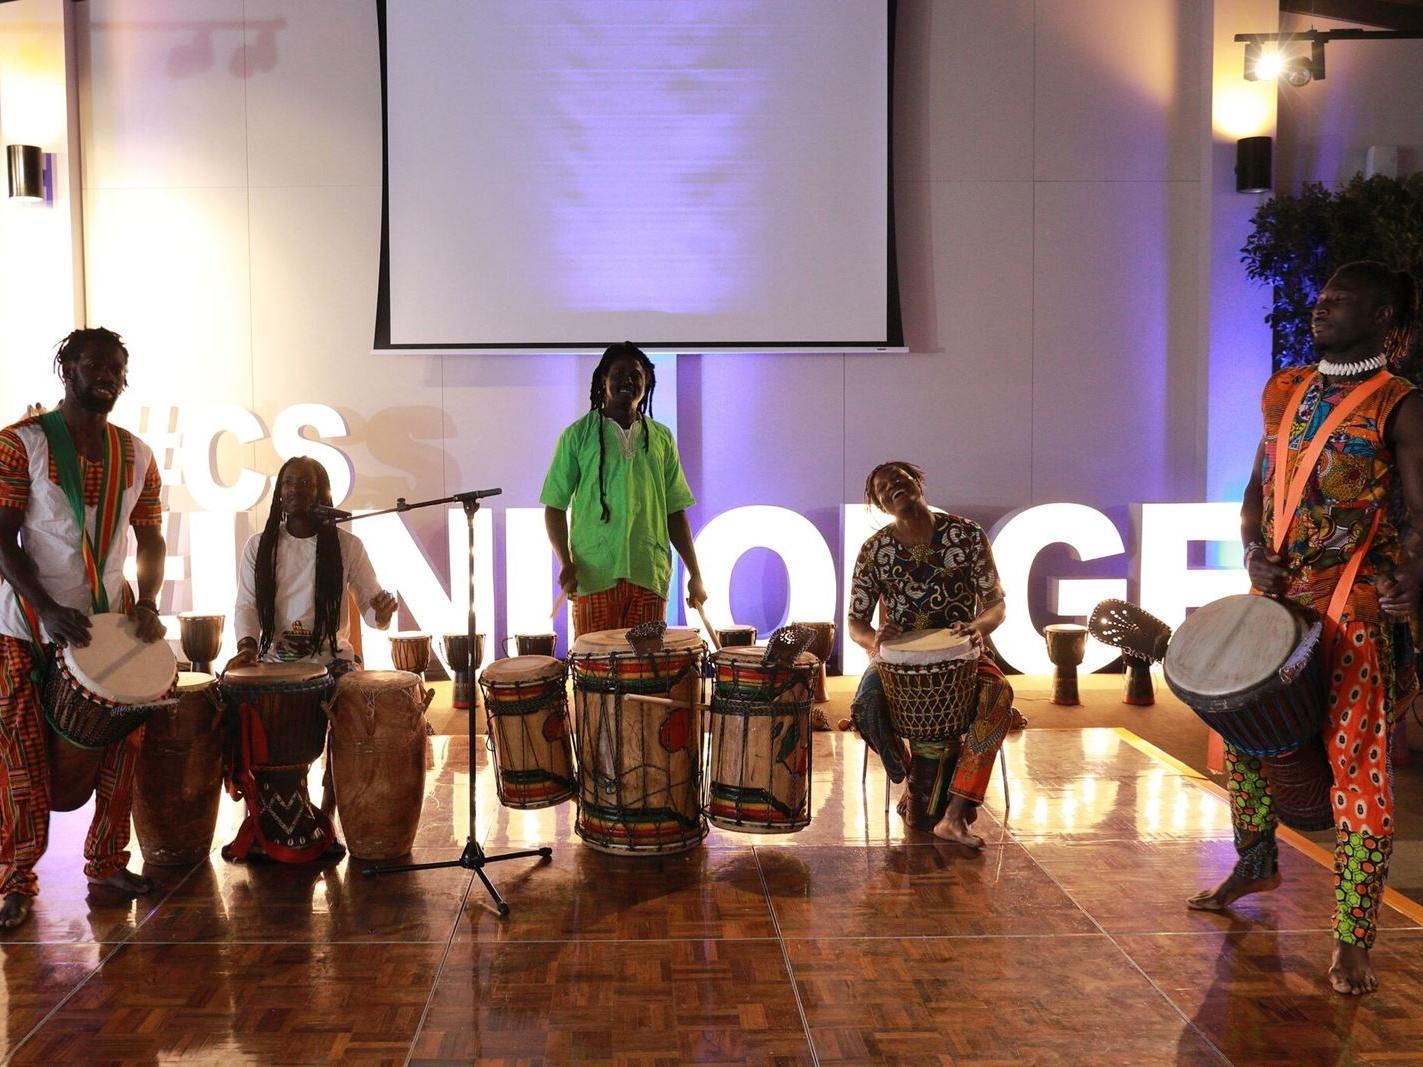 UniLodge Community Spirit Program in action